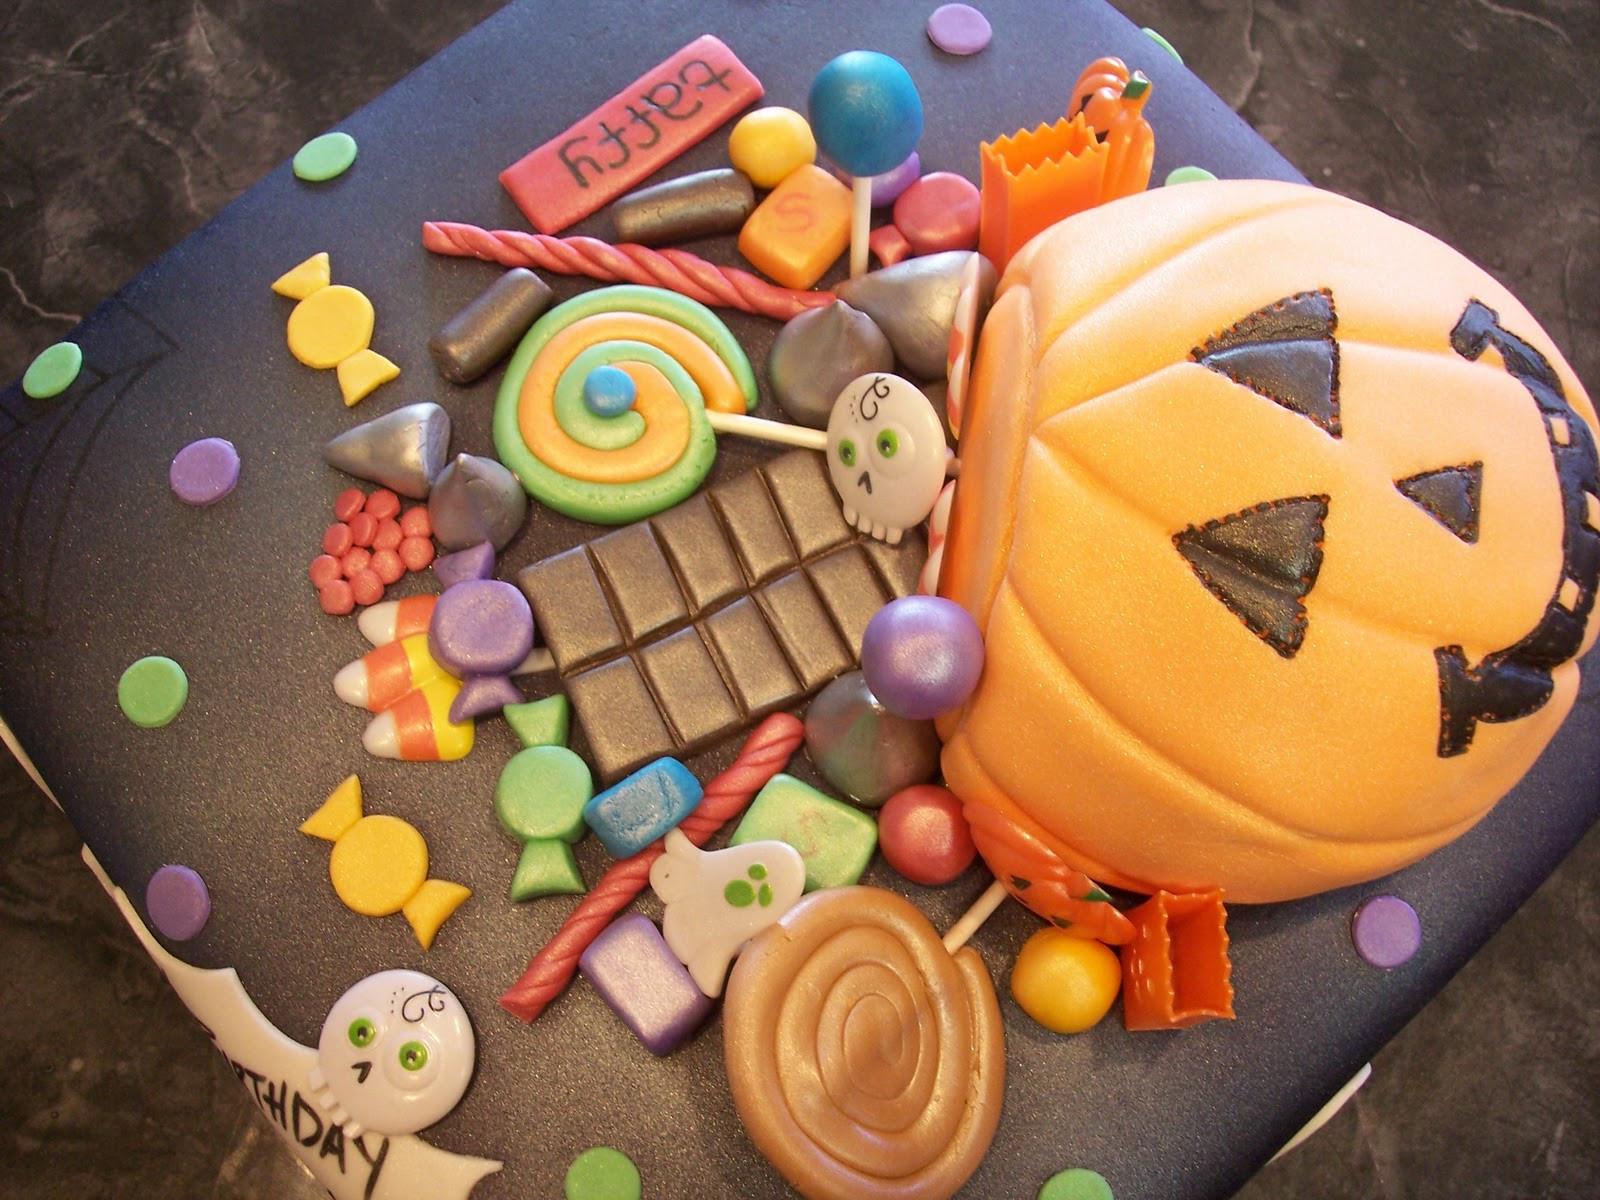 Halloween Fondant Cakes  MyMoniCakes Halloween Basket with Fondant Candy Cake